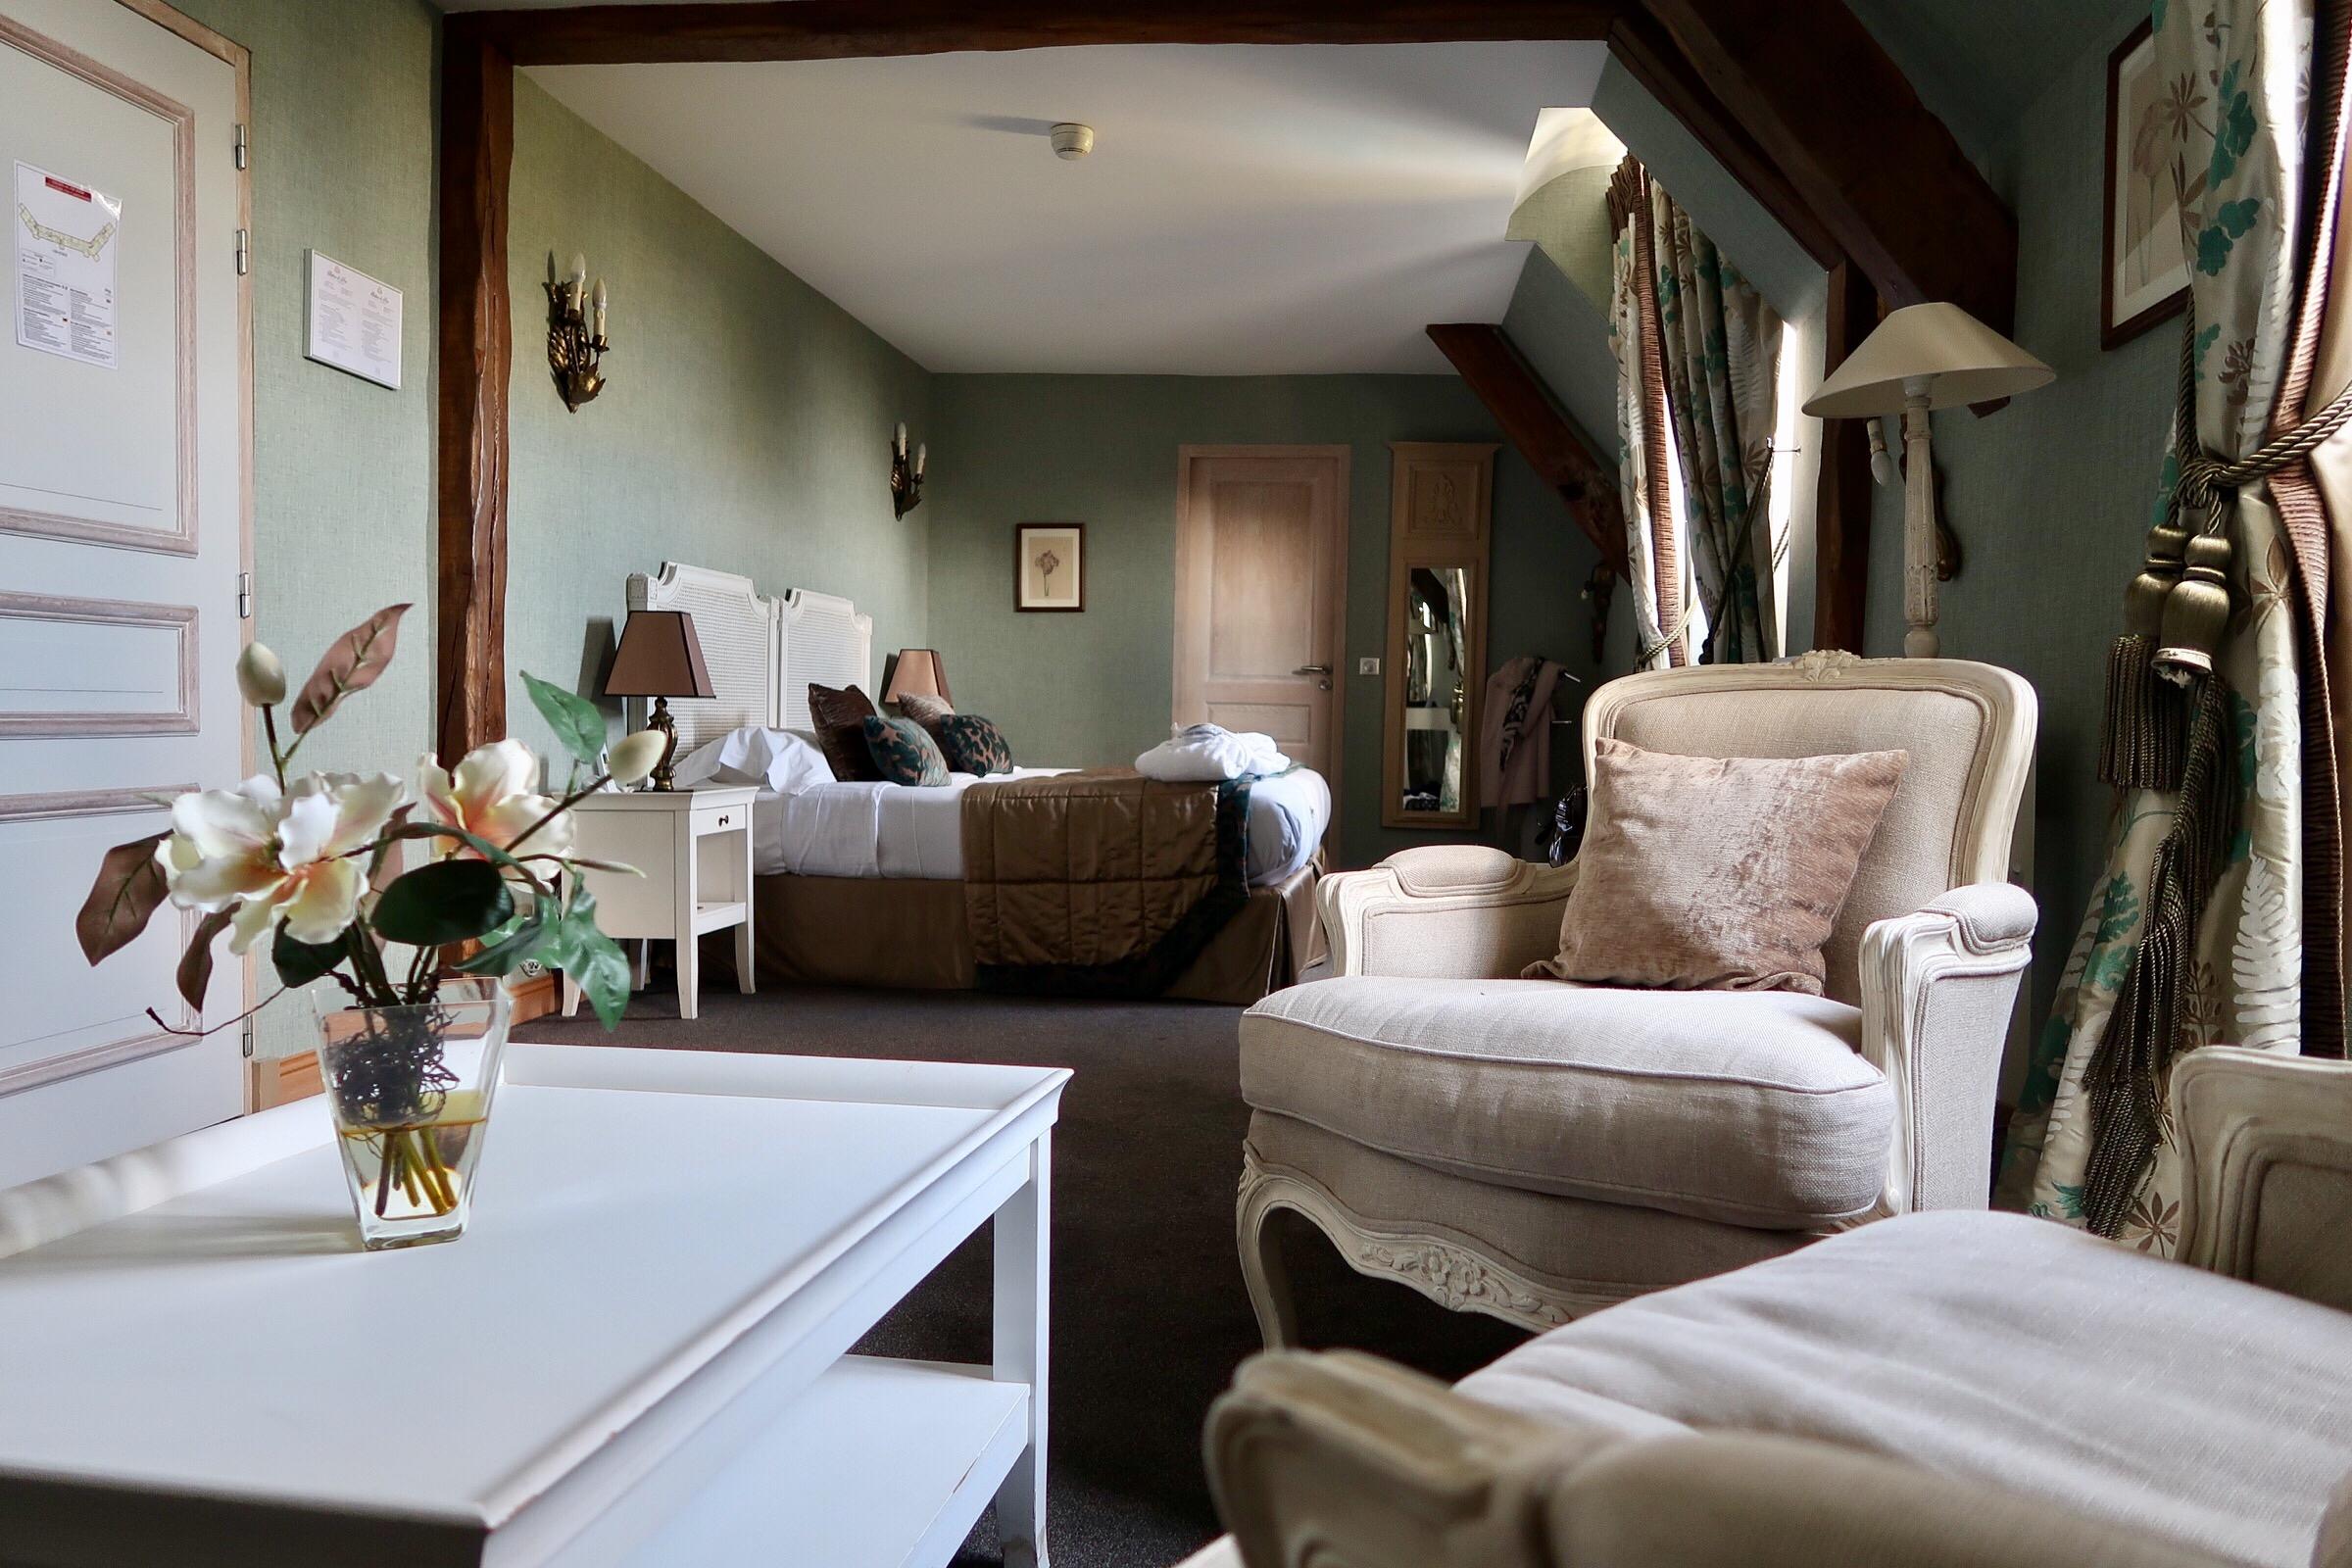 Chateau de Fere deluxe room